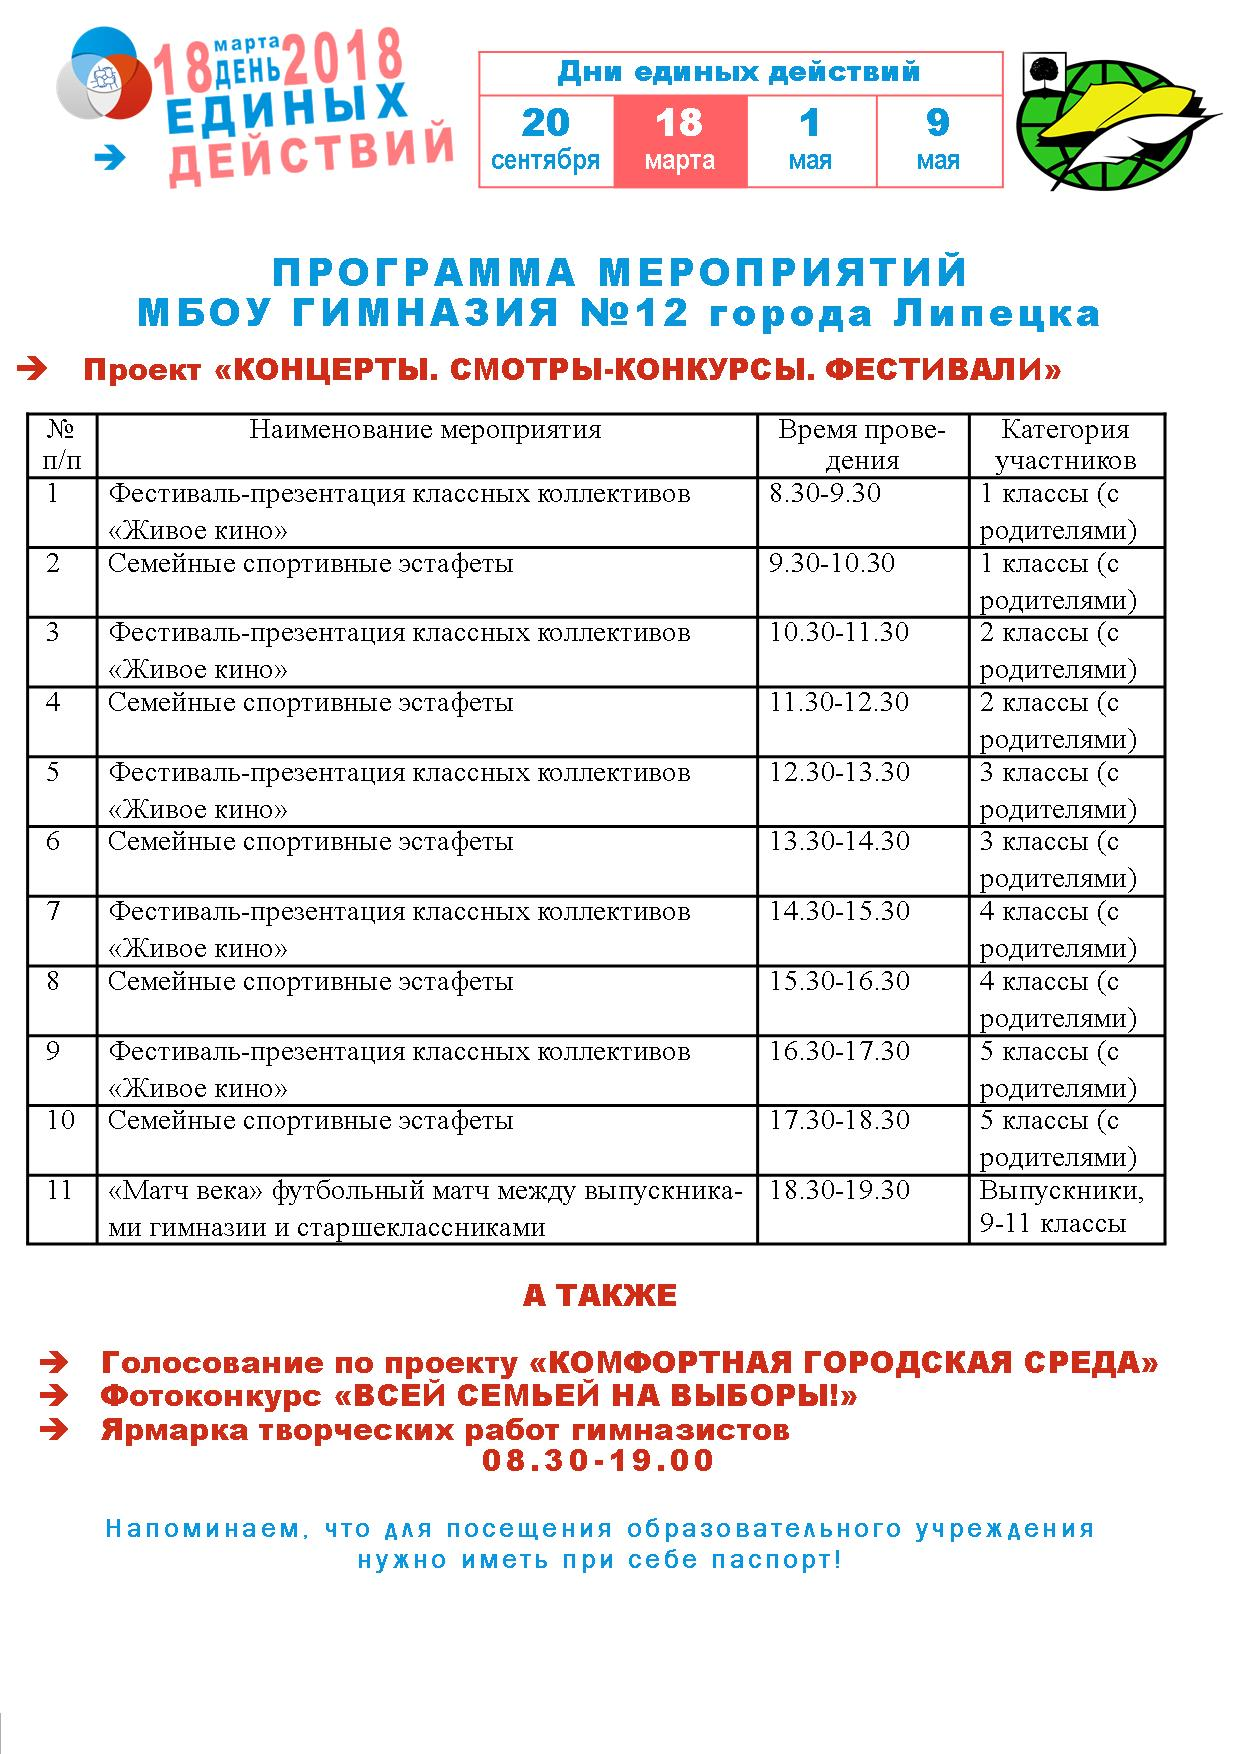 http://gimnasium12.ucoz.ru/image/18032018_2.jpg